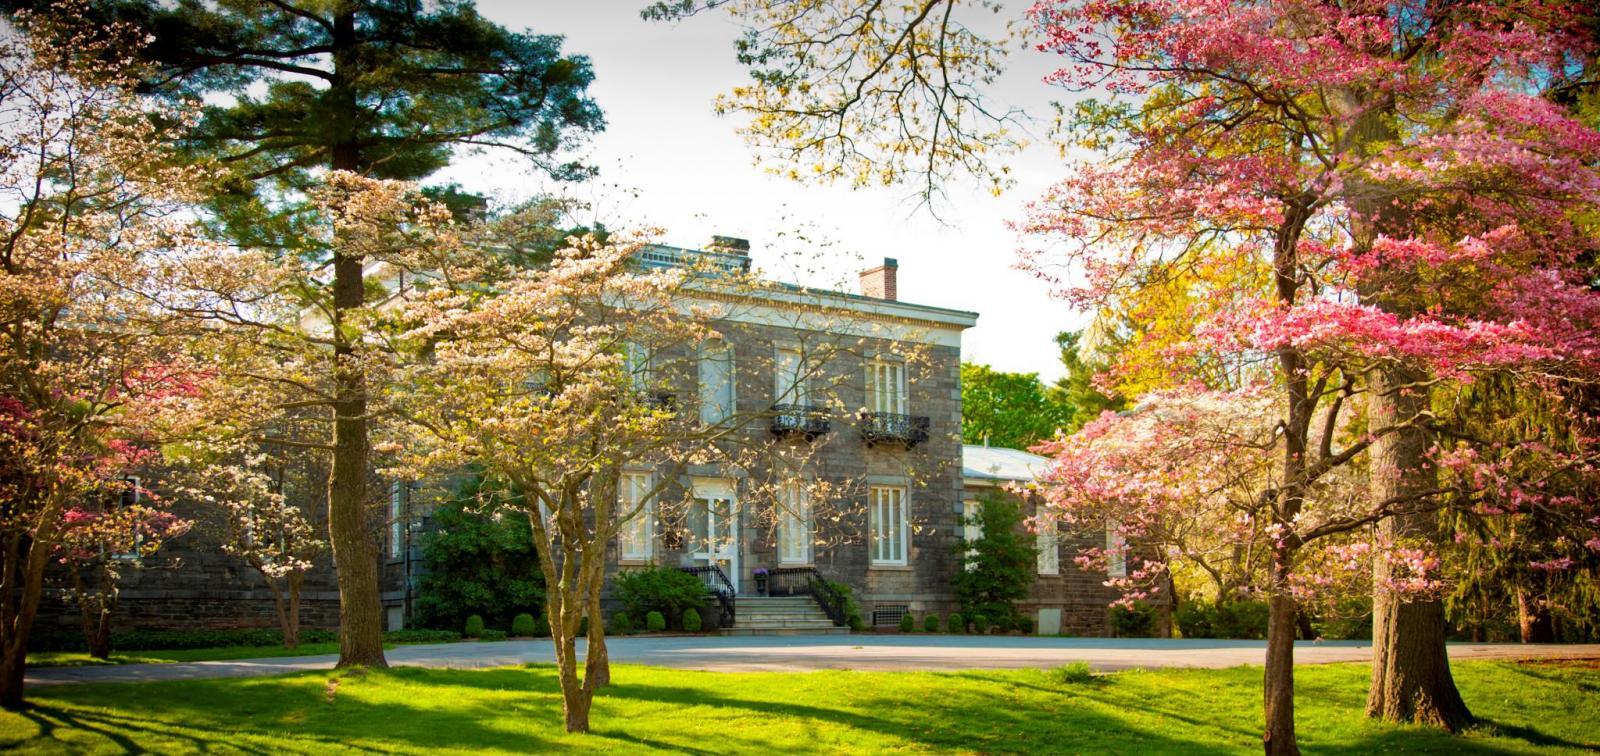 Das Bartow-Pell Mansion Museum